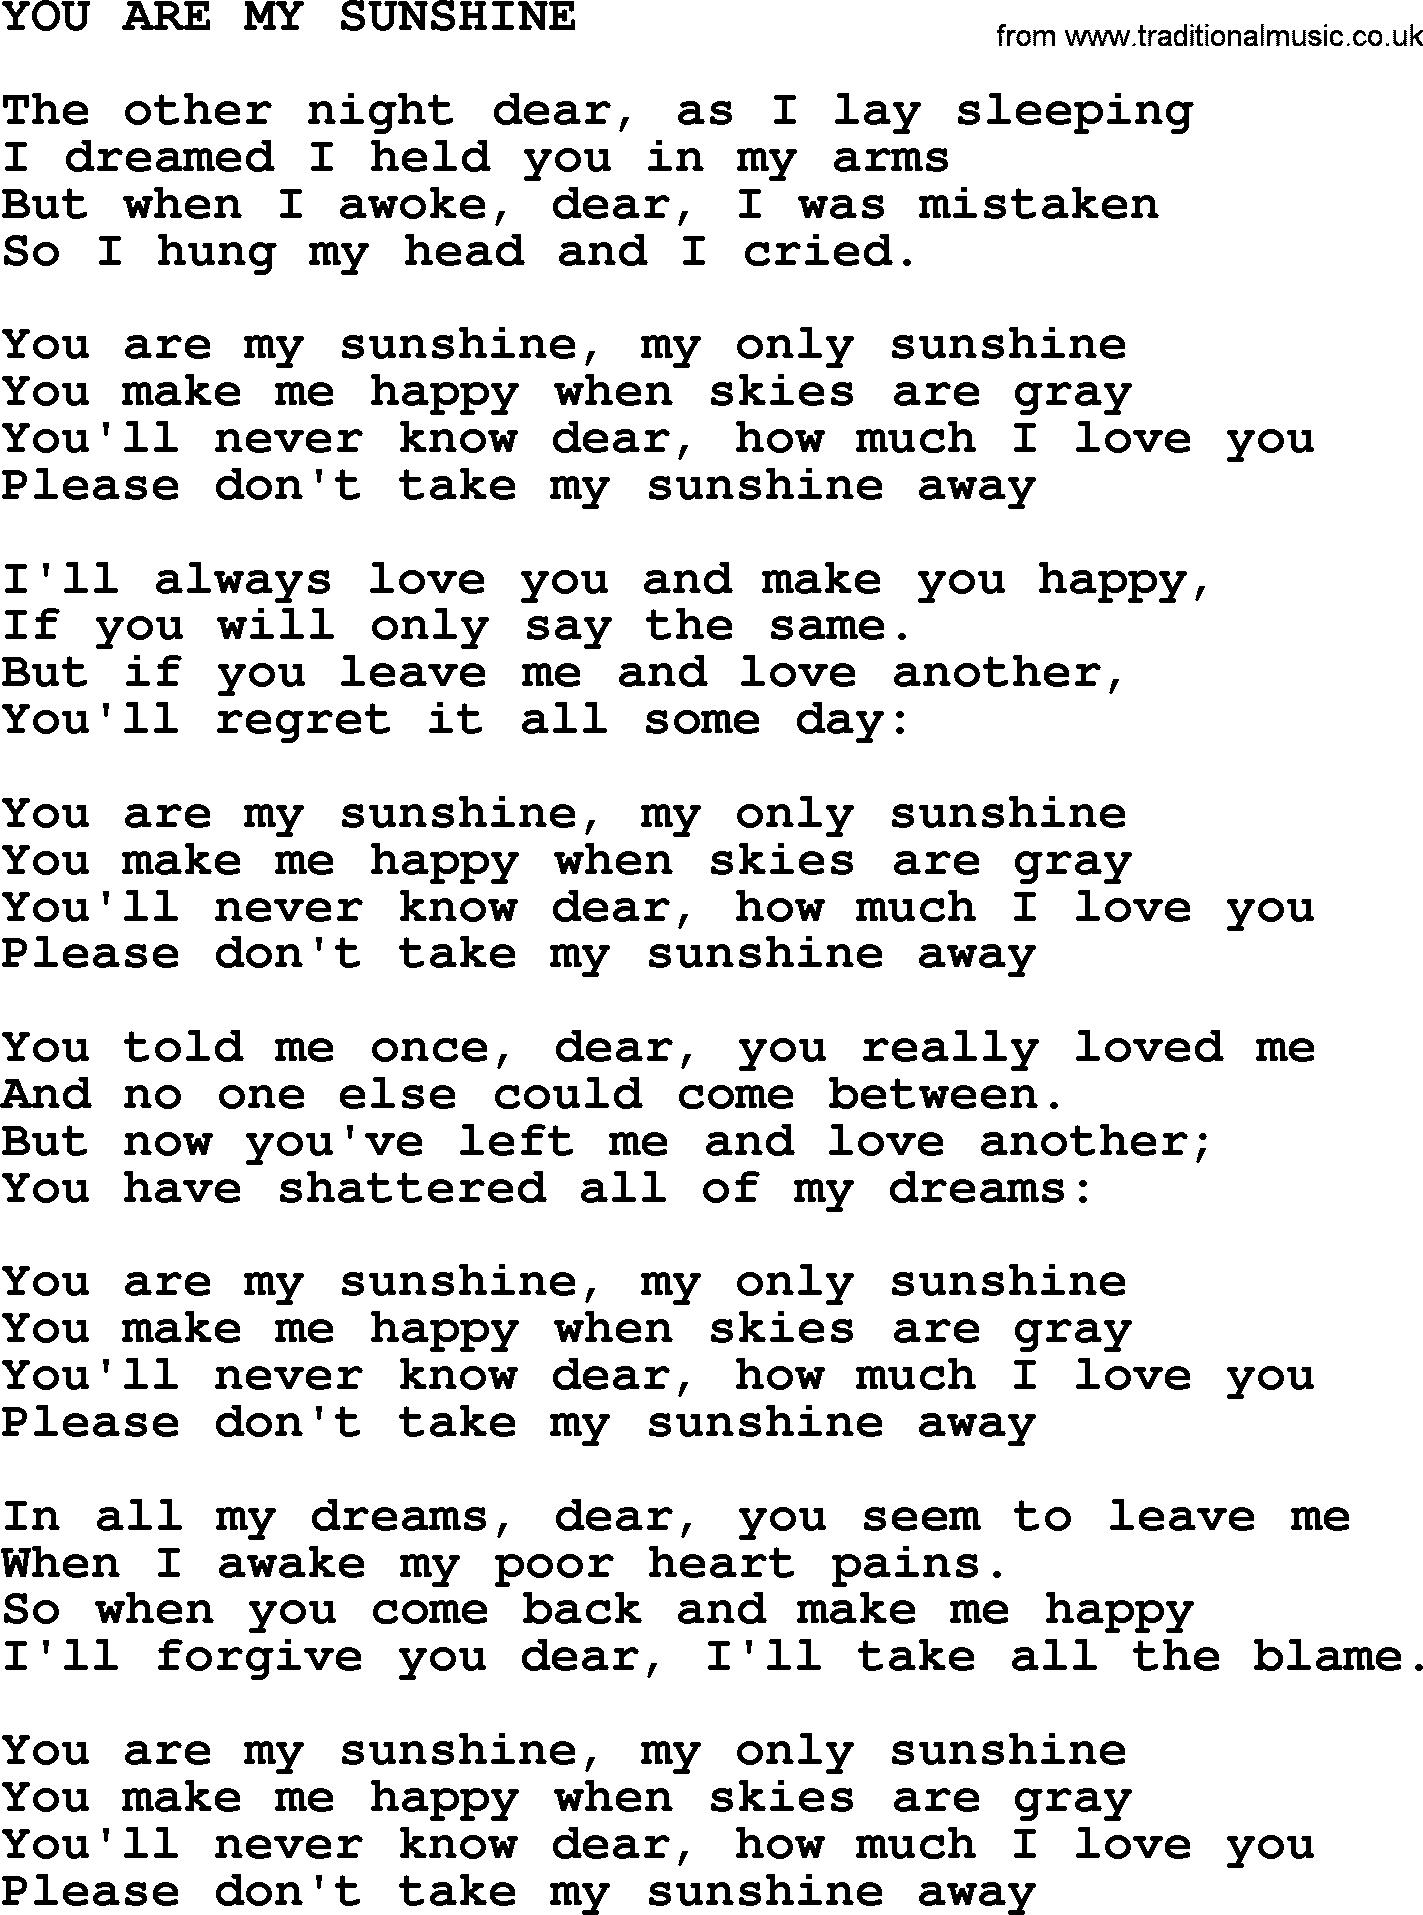 You Are My Sunshine Chords Johnny Cash Song You Are My Sunshine Lyrics